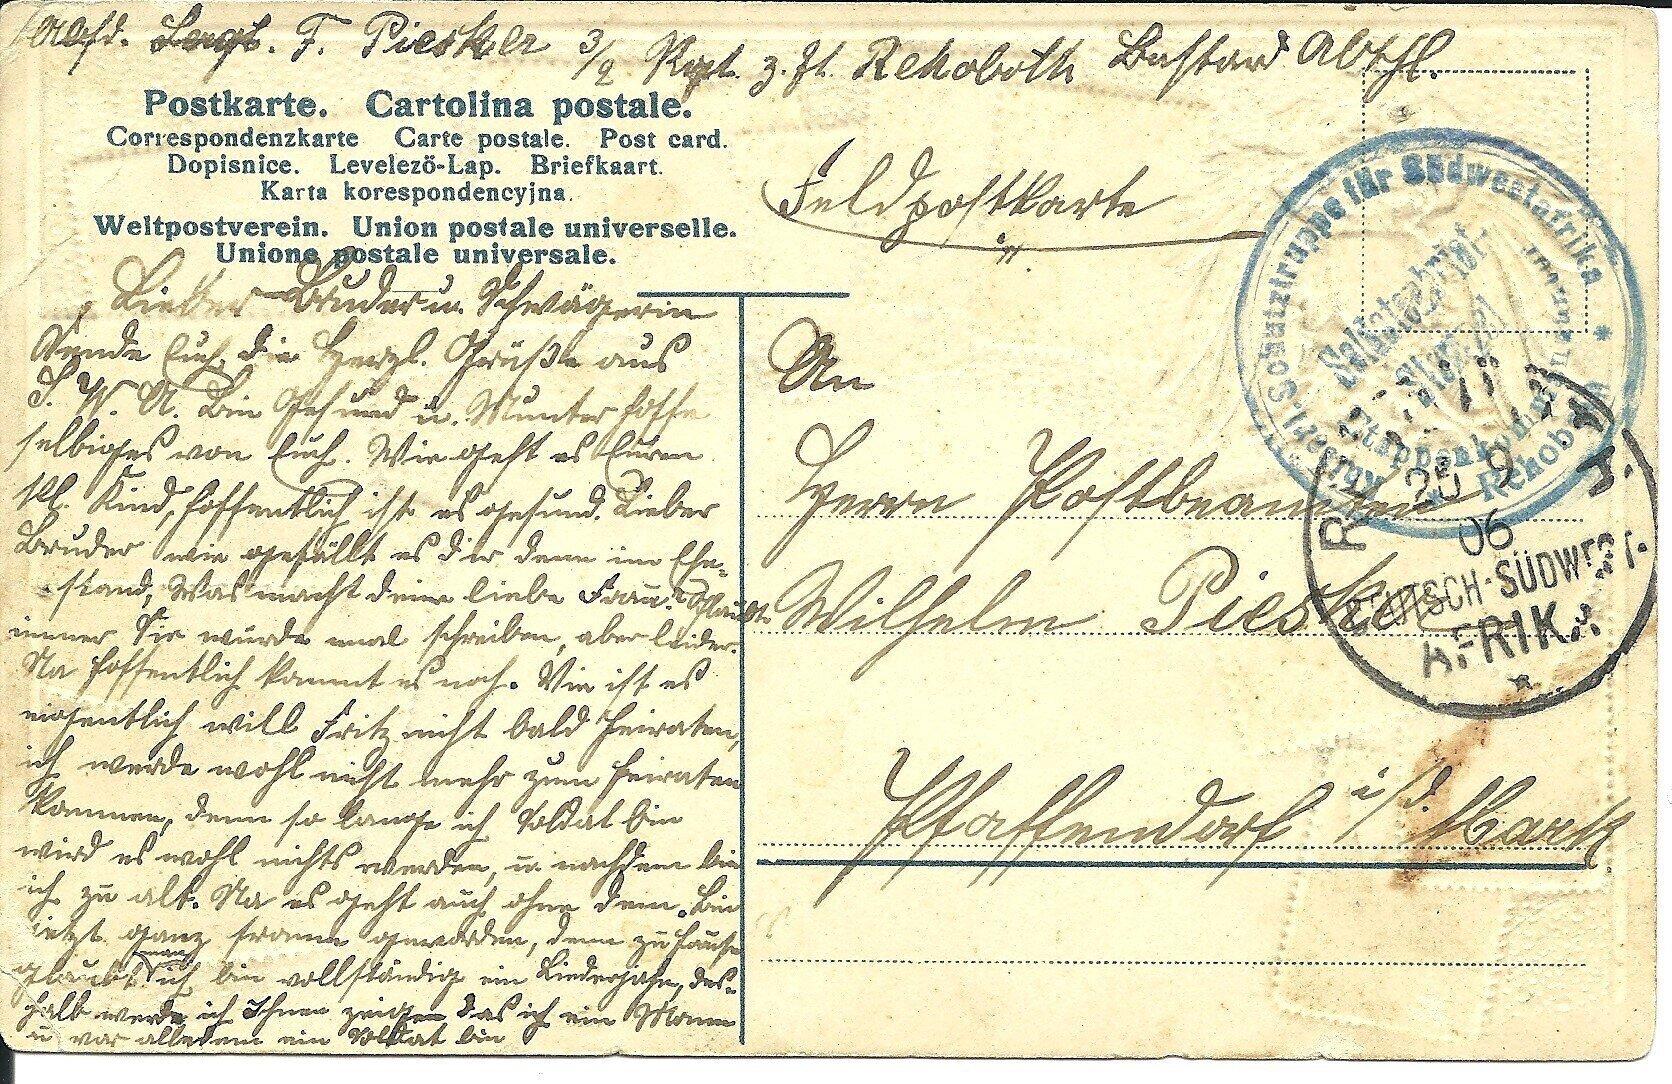 Postkarte Afrika 1906 Rückseite